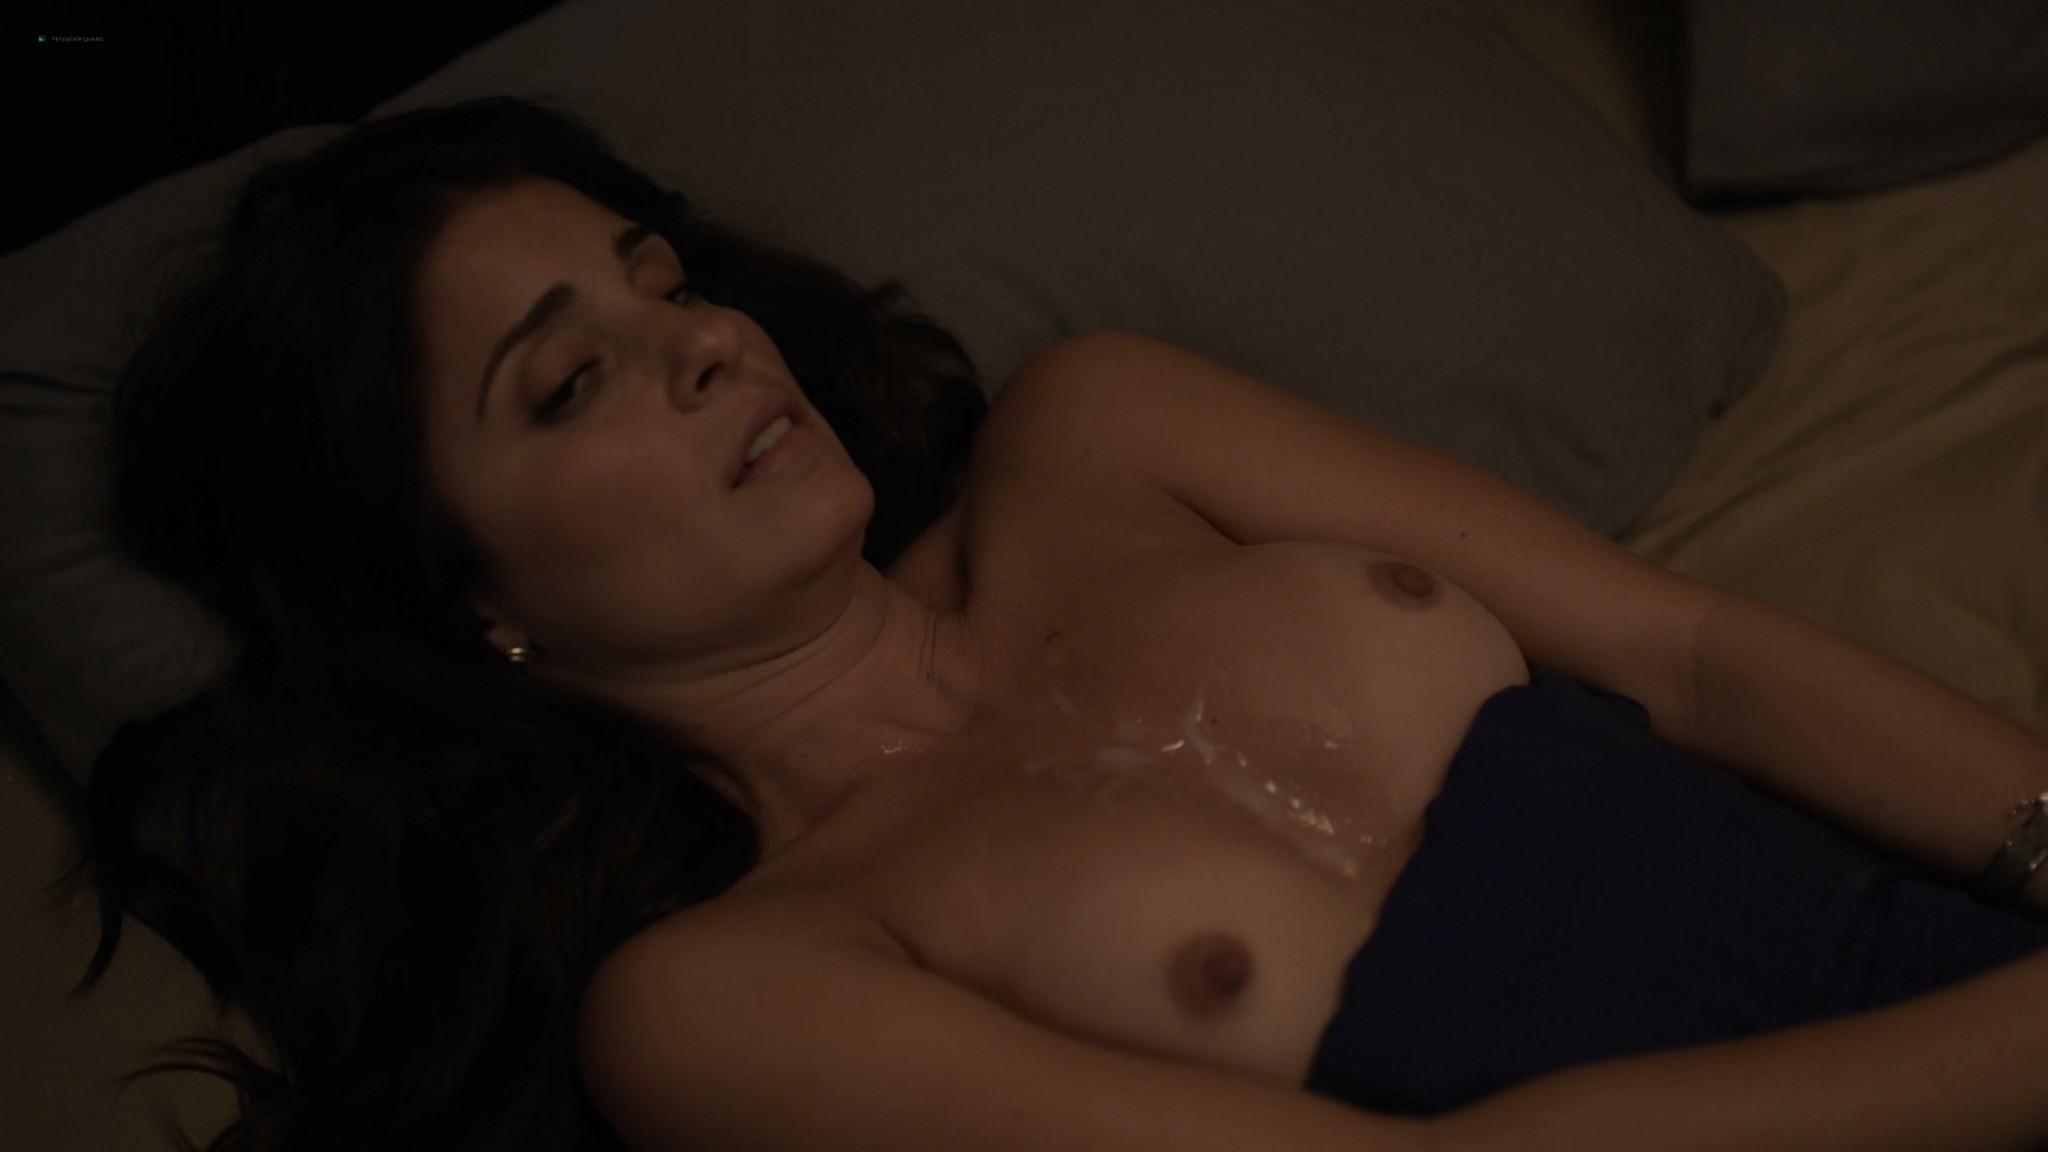 Shiri Appleby nude cum on her tits Allison Williams Zosia Mamet sexy Girls 2013 s2e 6 10 1080p Web 10